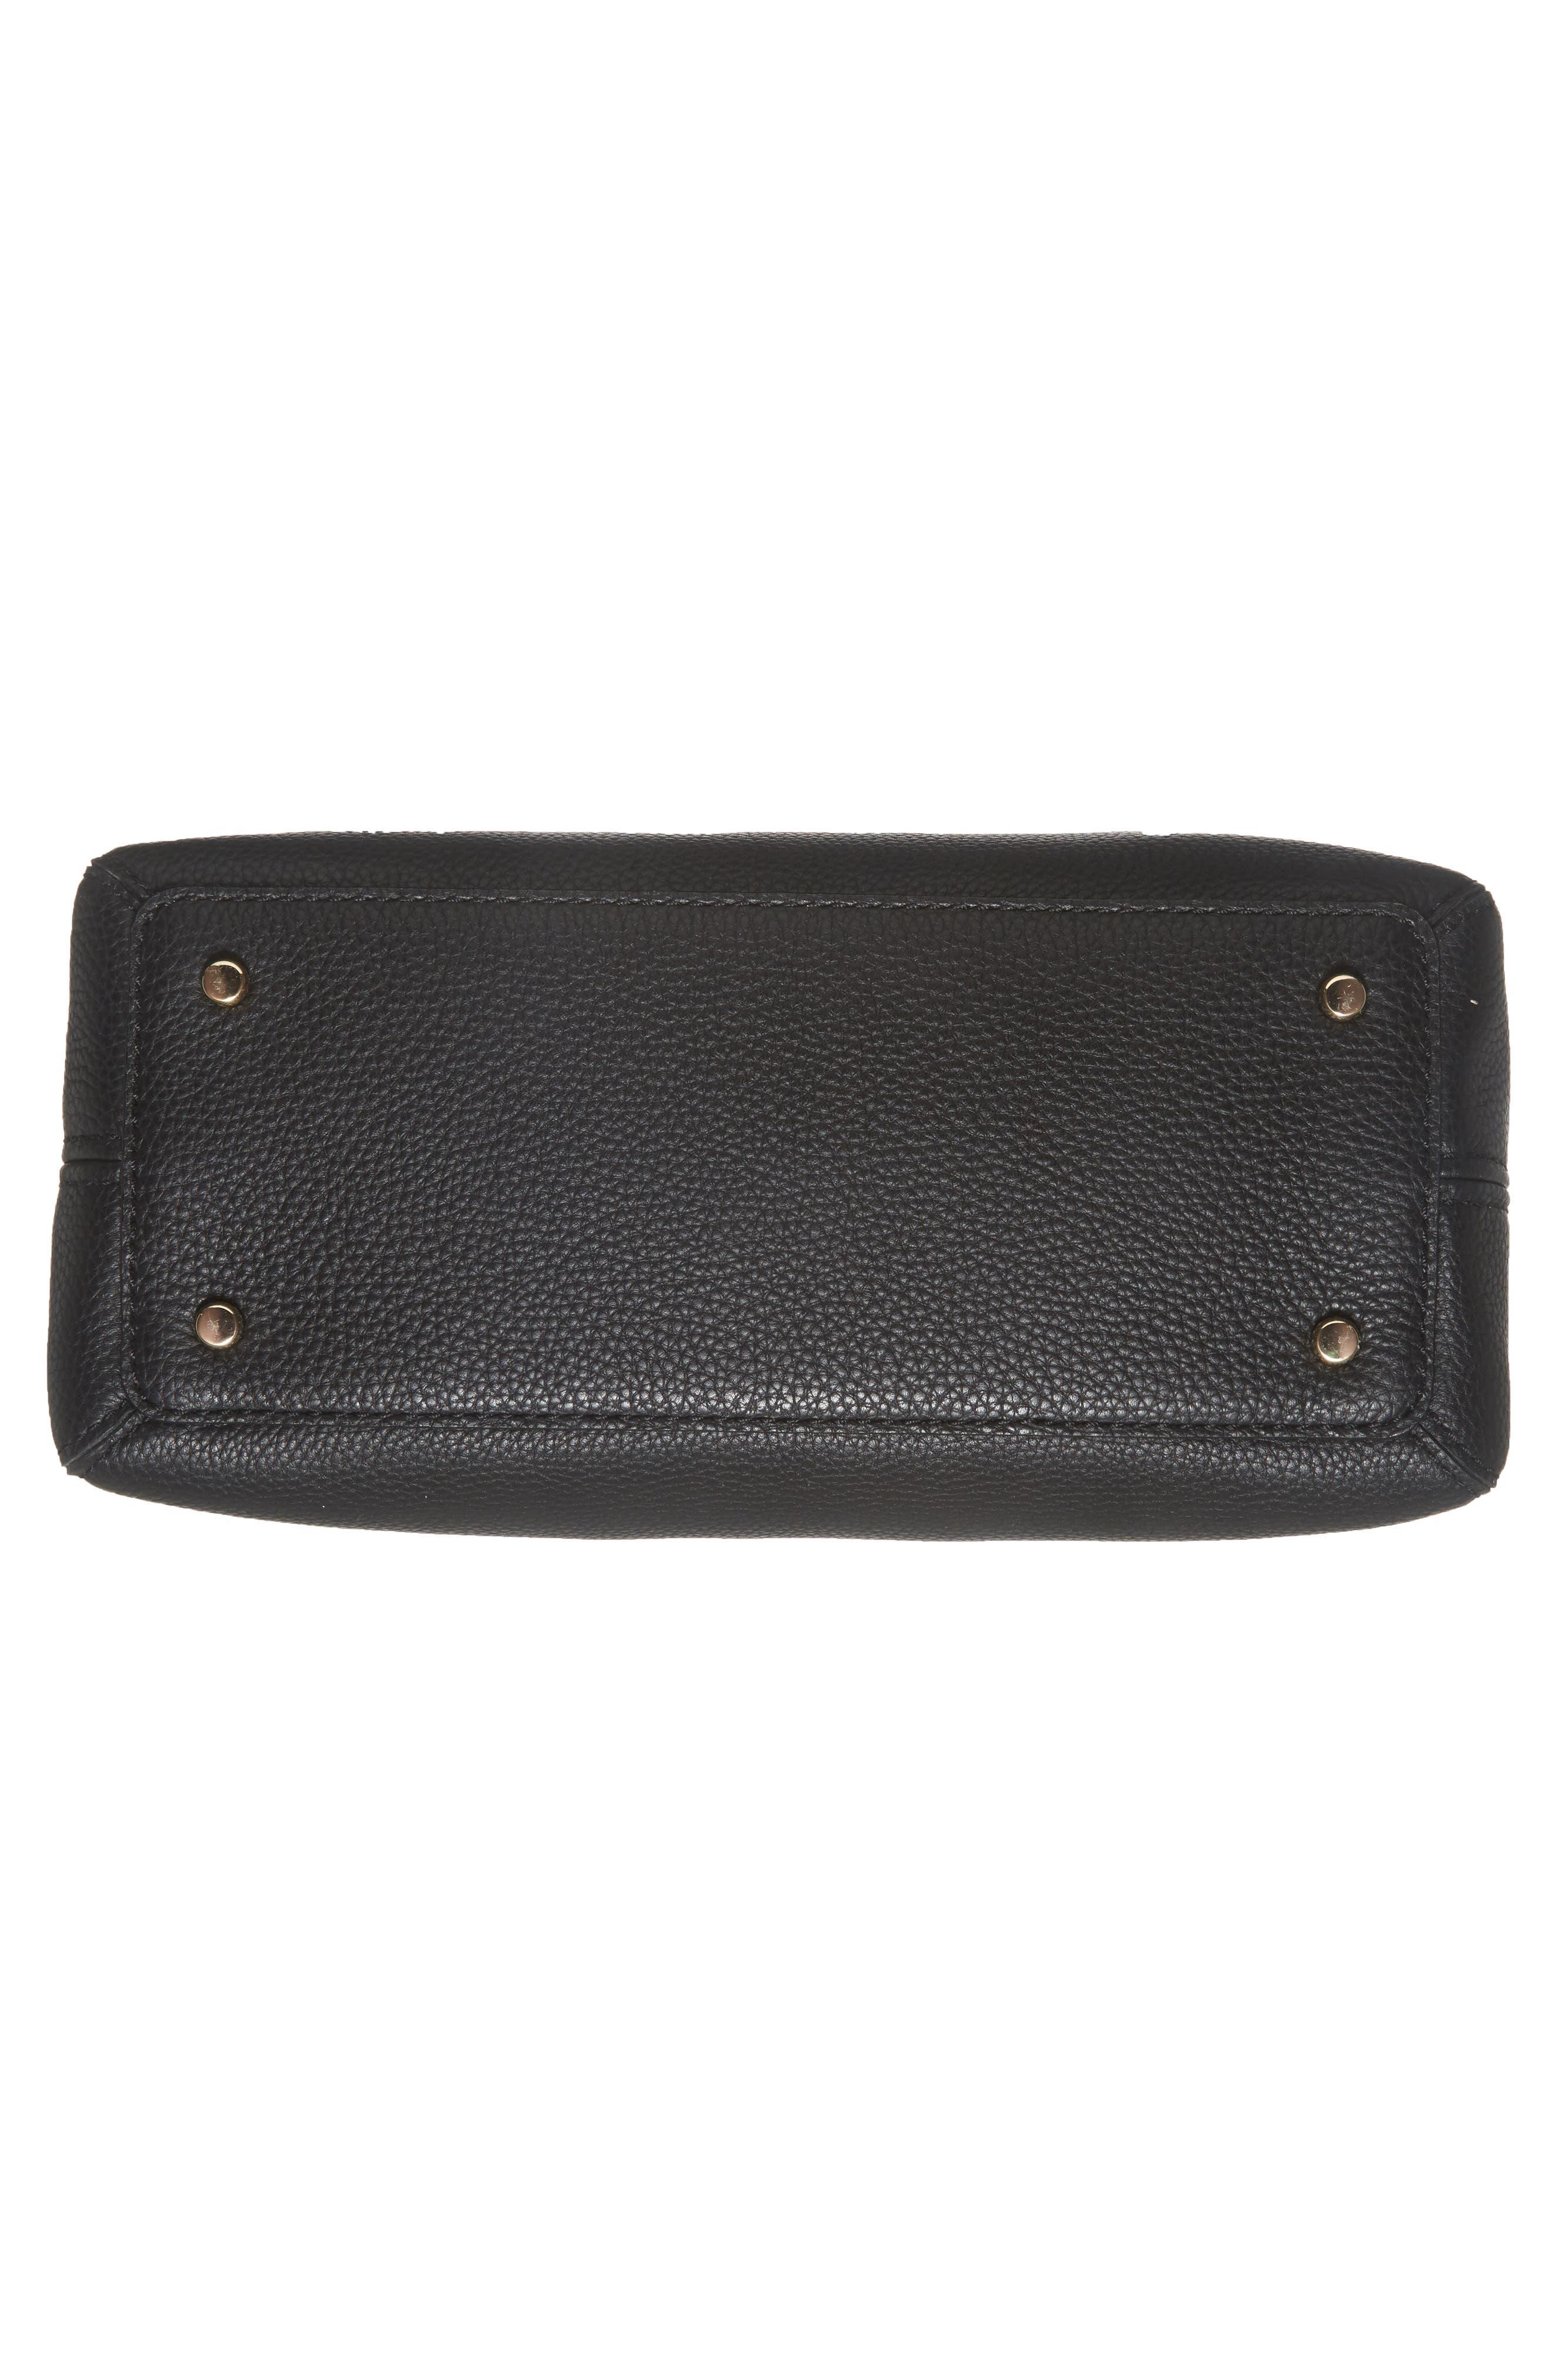 jackson street lottie leather satchel,                             Alternate thumbnail 6, color,                             001